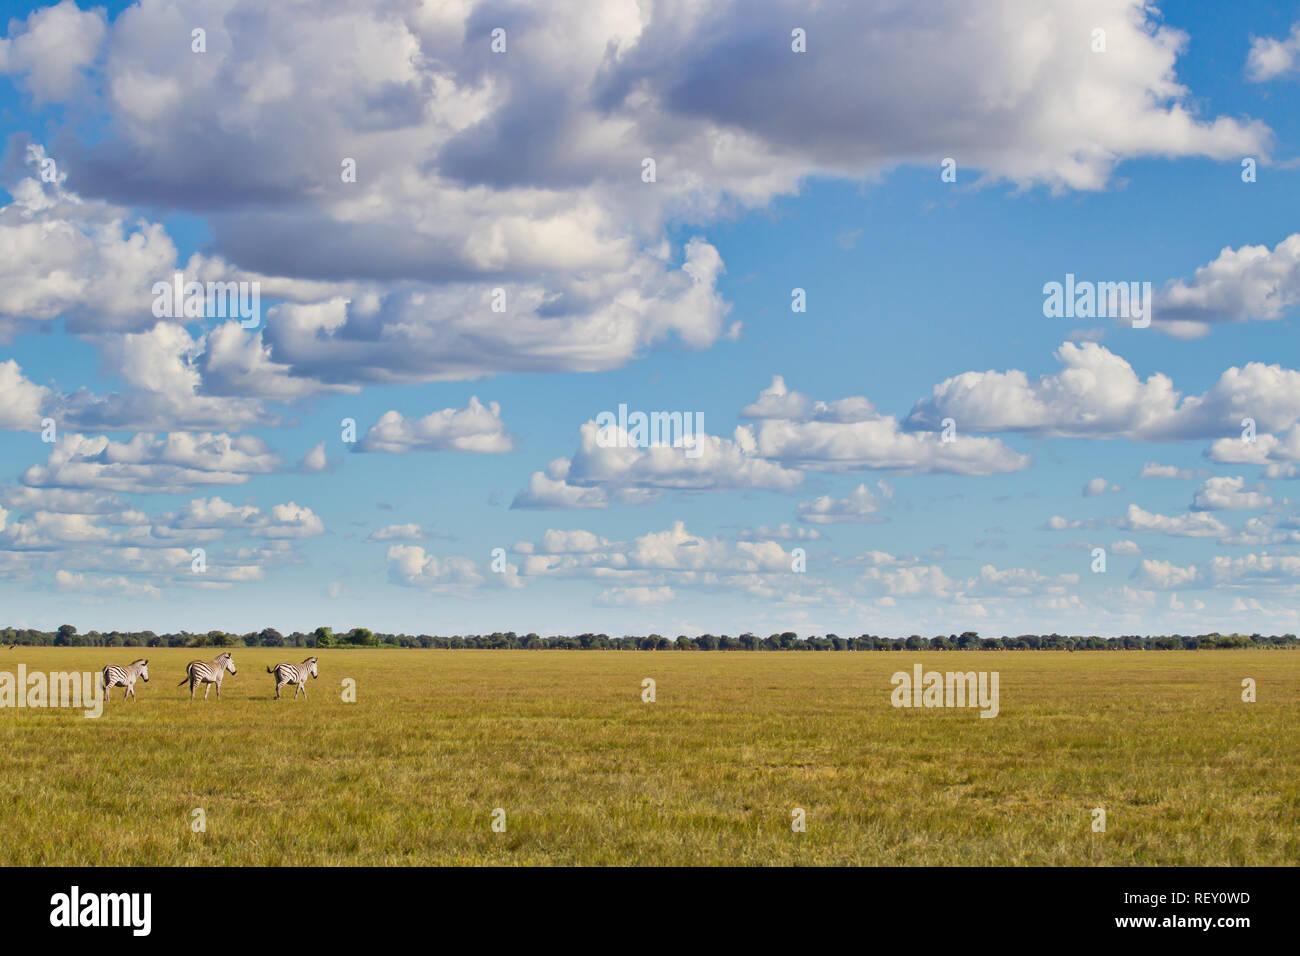 Chikuni Plains Stock Photos & Chikuni Plains Stock Images - Alamy